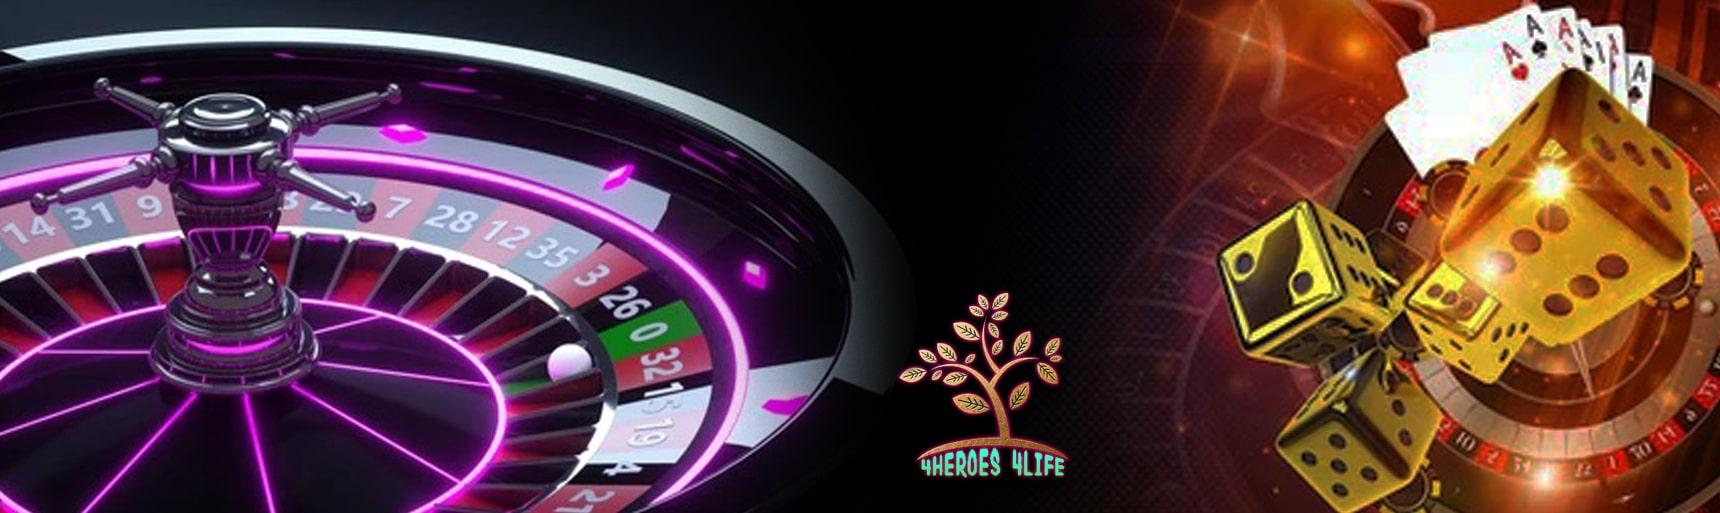 Manfaat main casino online